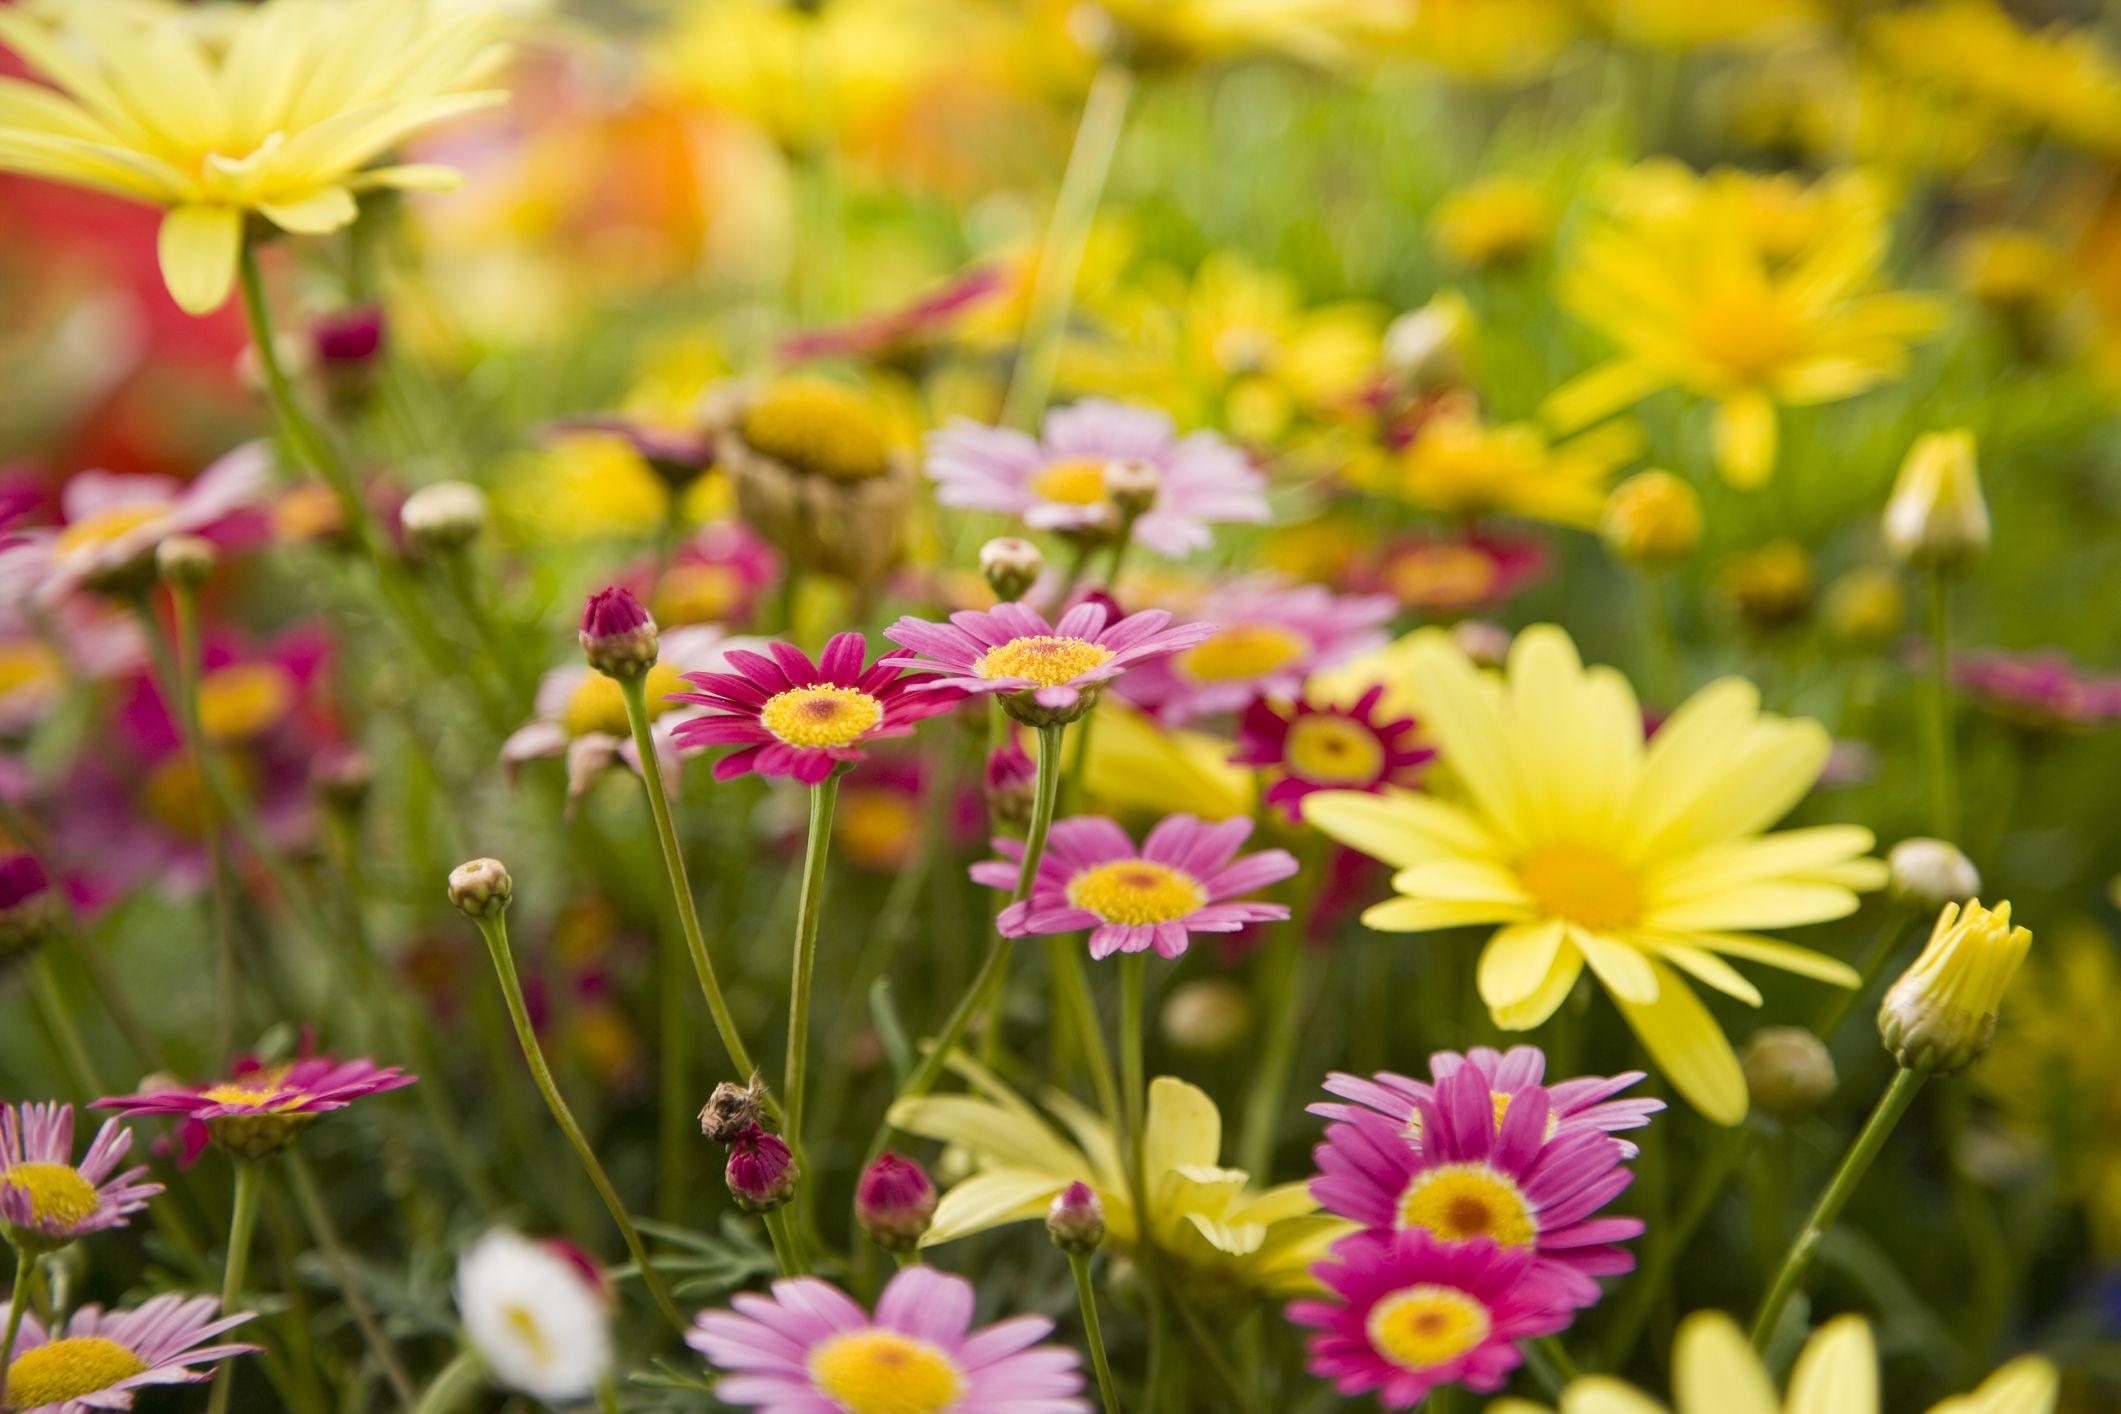 Daisy Flowers Greenery Shrubs Flower Garden